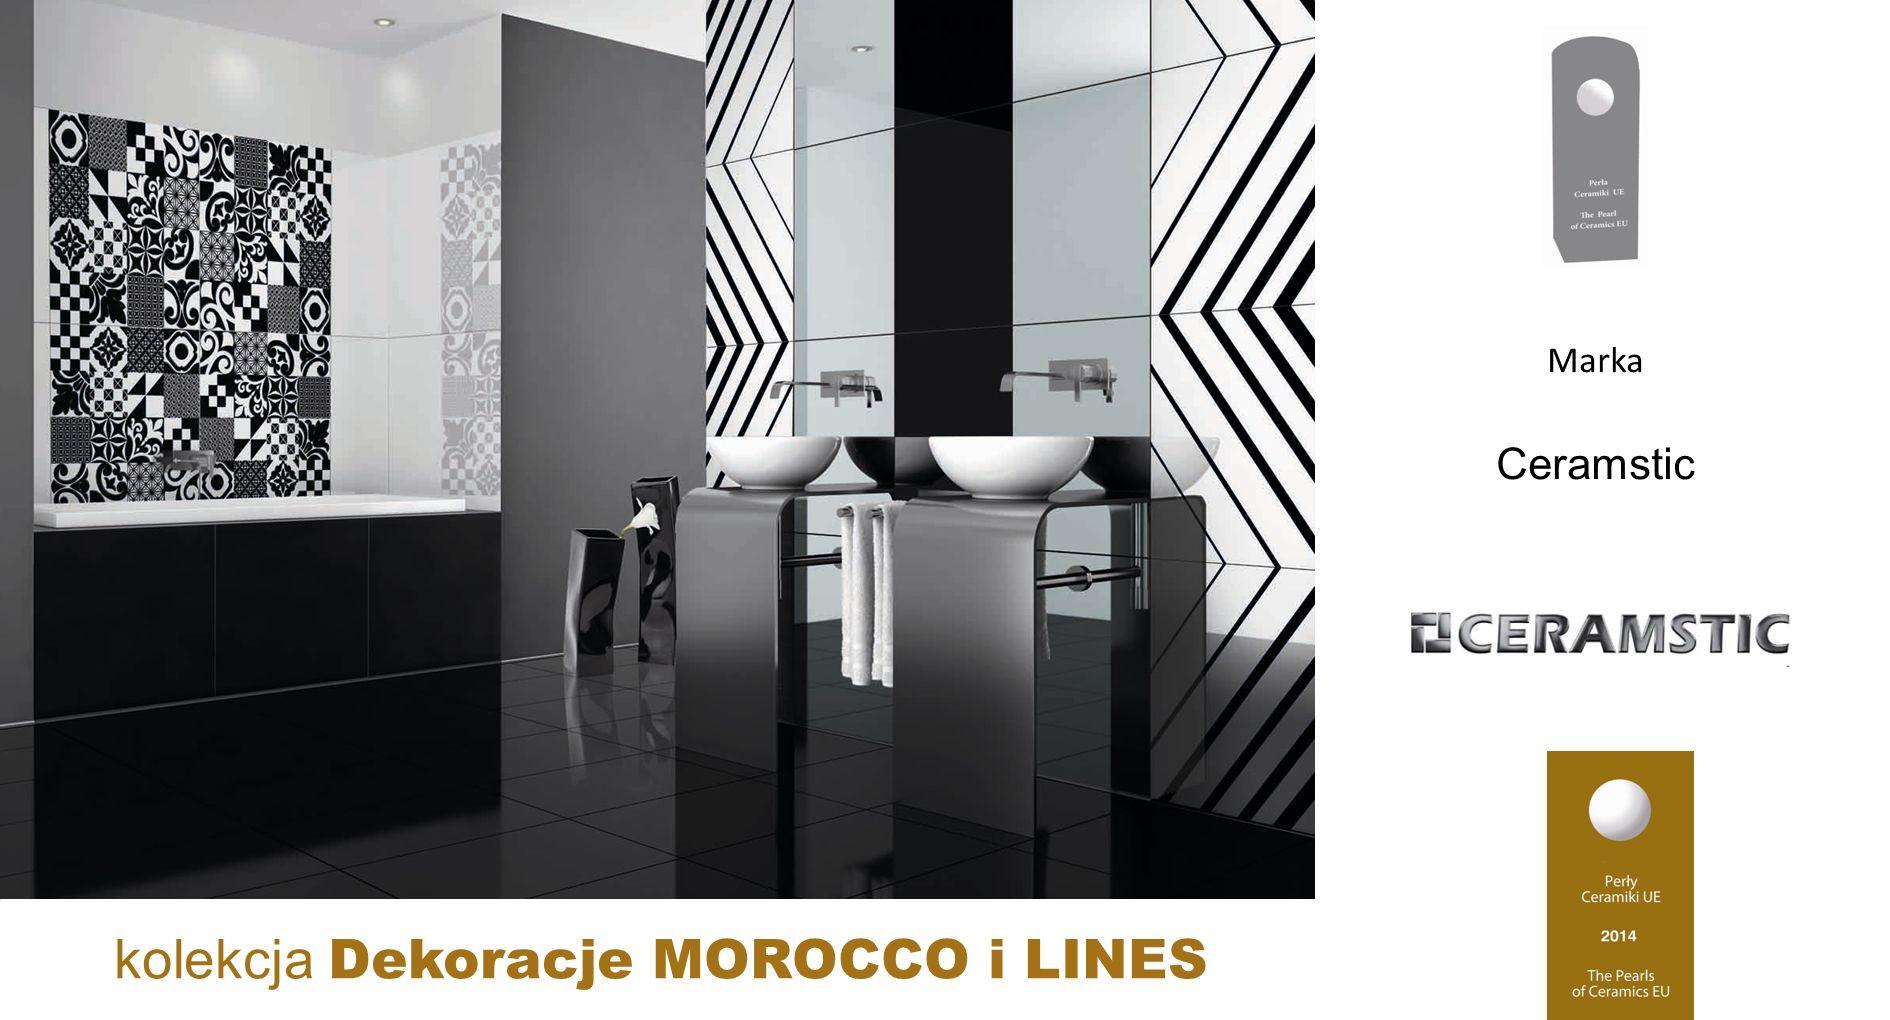 Ceramstic kolekcja Dekoracje MOROCCO i LINES Marka